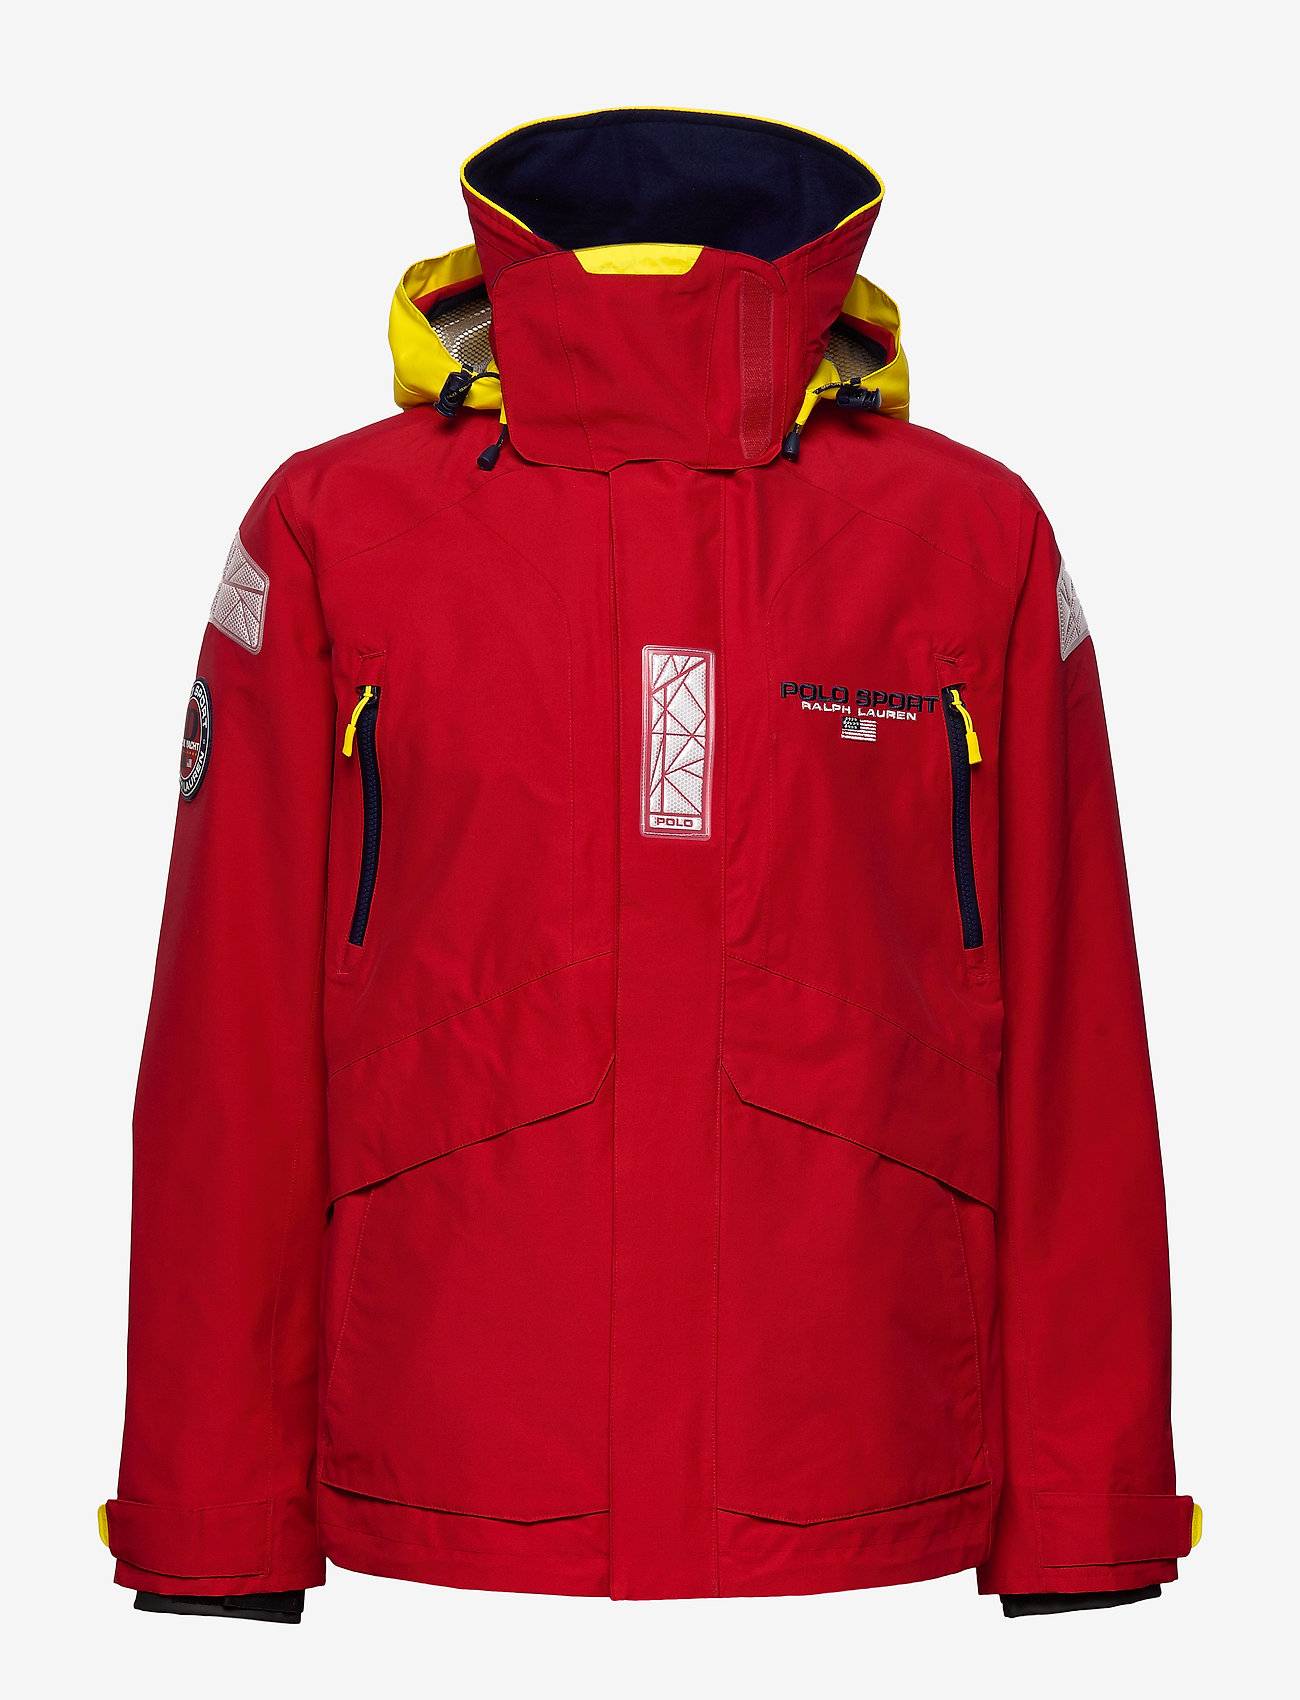 Polo Ralph Laurenpolo Sport Hooded Jacket - Jacken & Mäntel